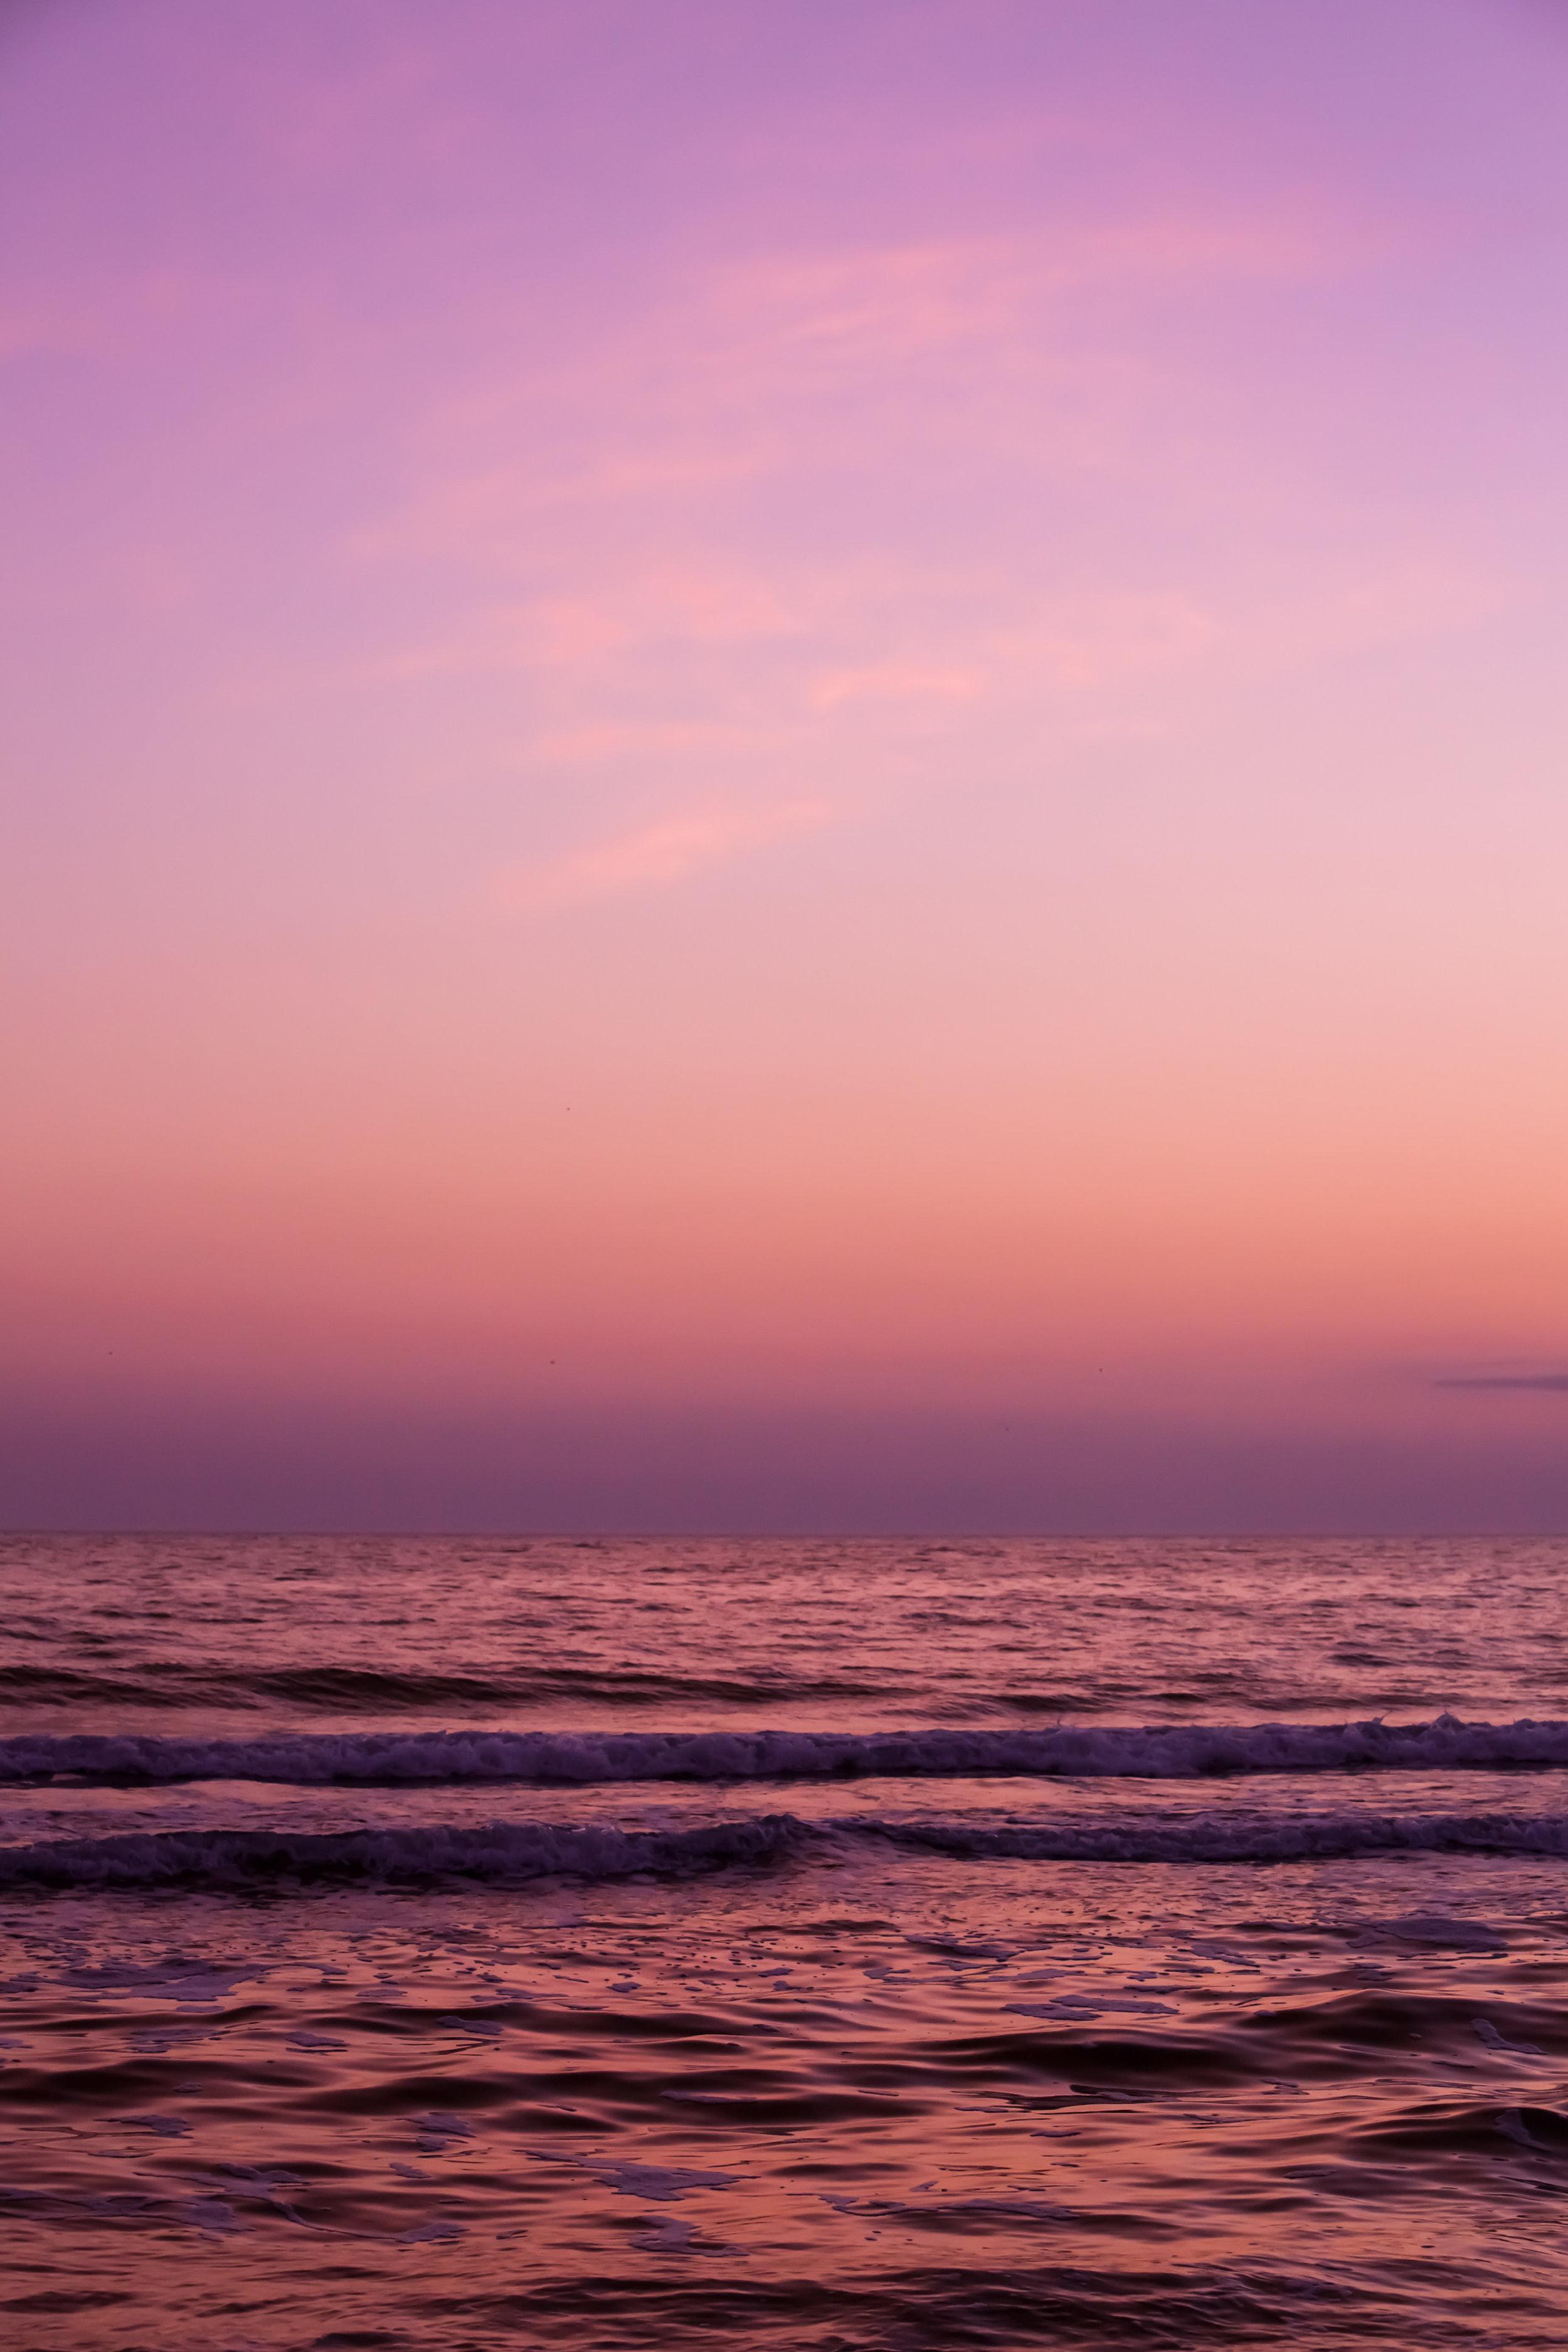 passage-ocean-1303-9109-smugmug.jpg